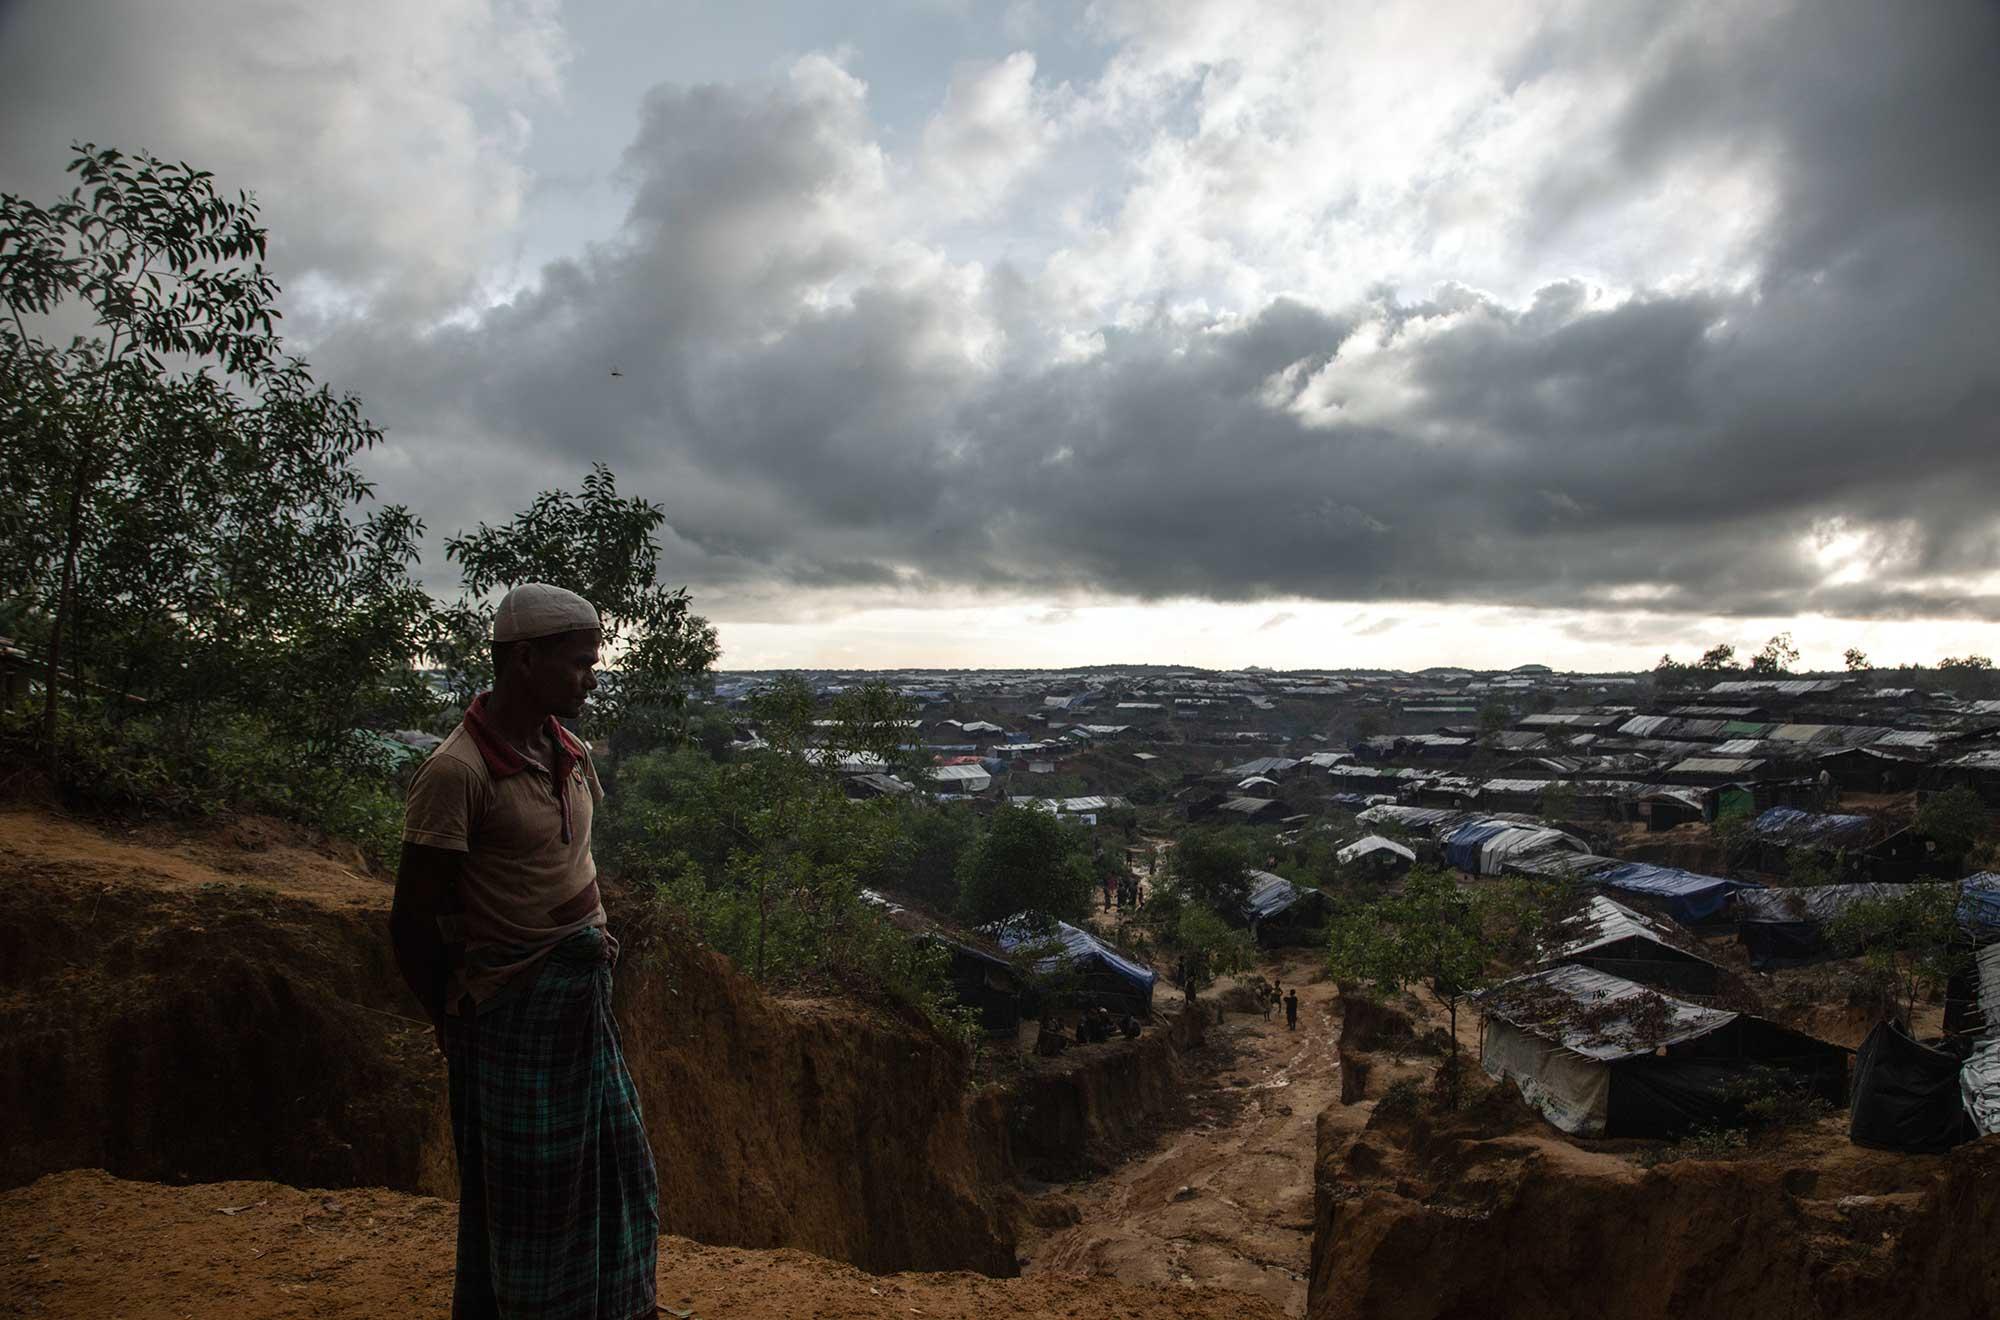 264096 daemonisierung-rohingya-Menschenrechtsthemen-Jahrzehnt | © Ahmer Khan/Amnesty International